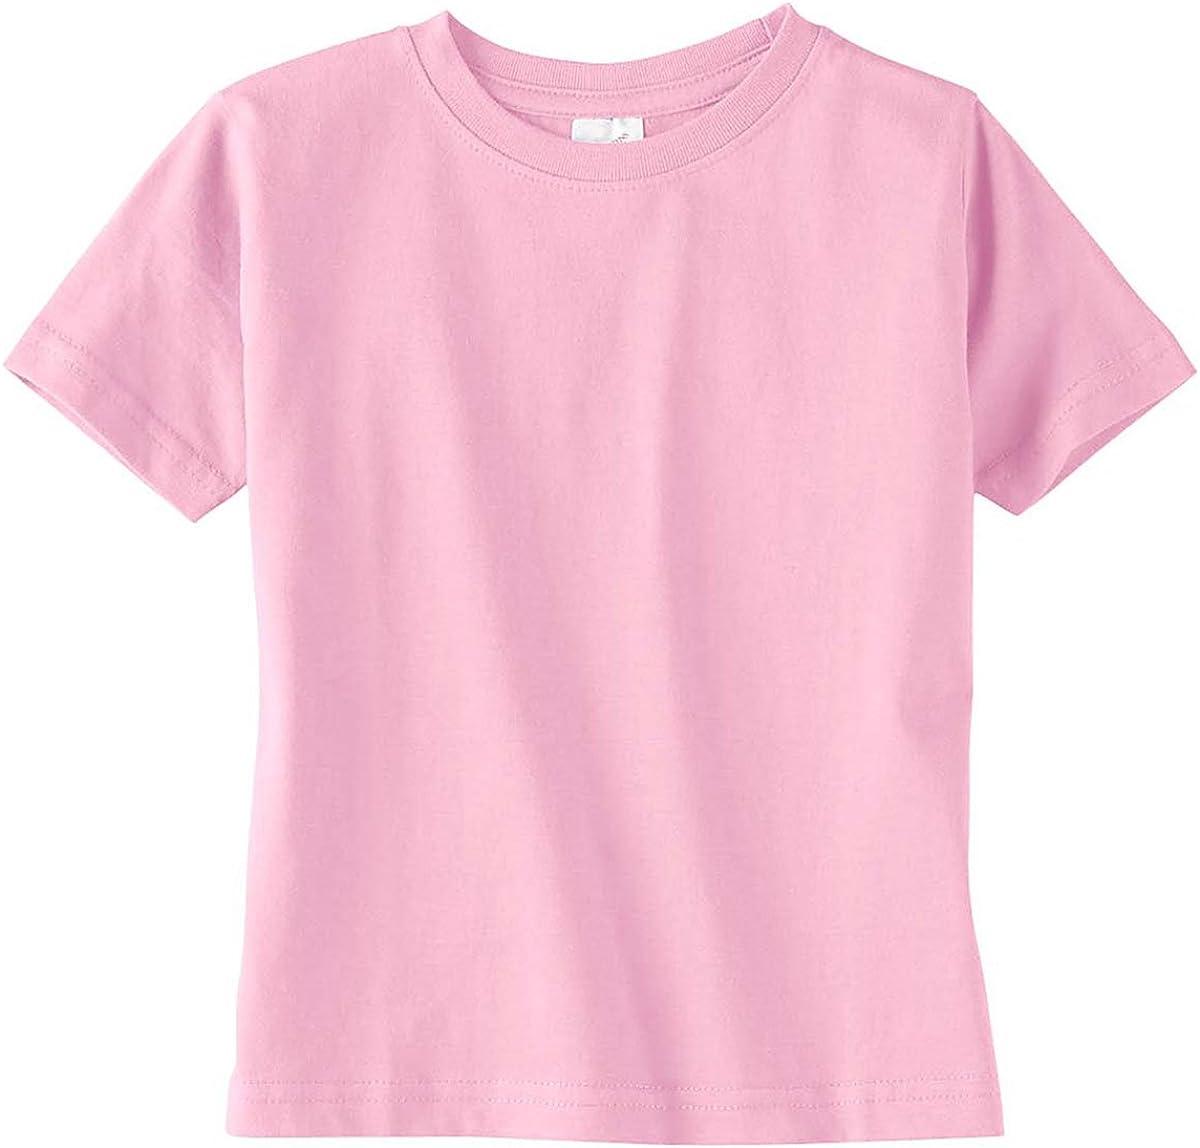 RABBIT SKINS Toddler's 4.5 oz. Fine Jersey T-Shirt